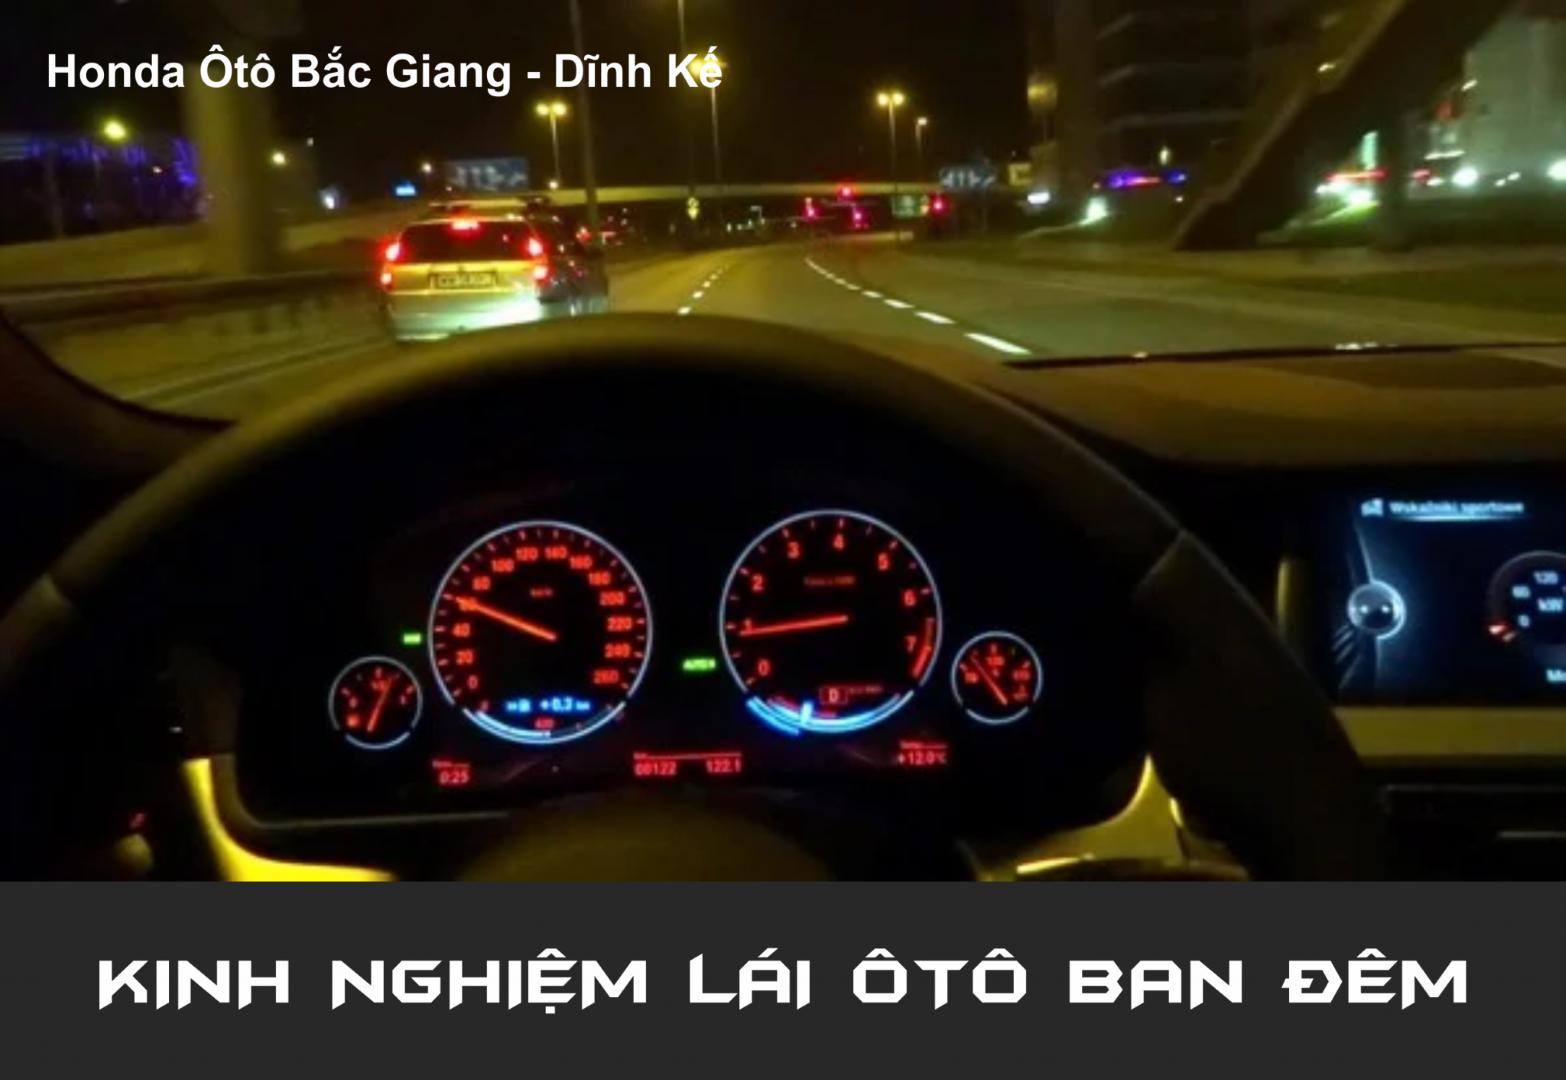 lai_oto_ban_dem_hbgg